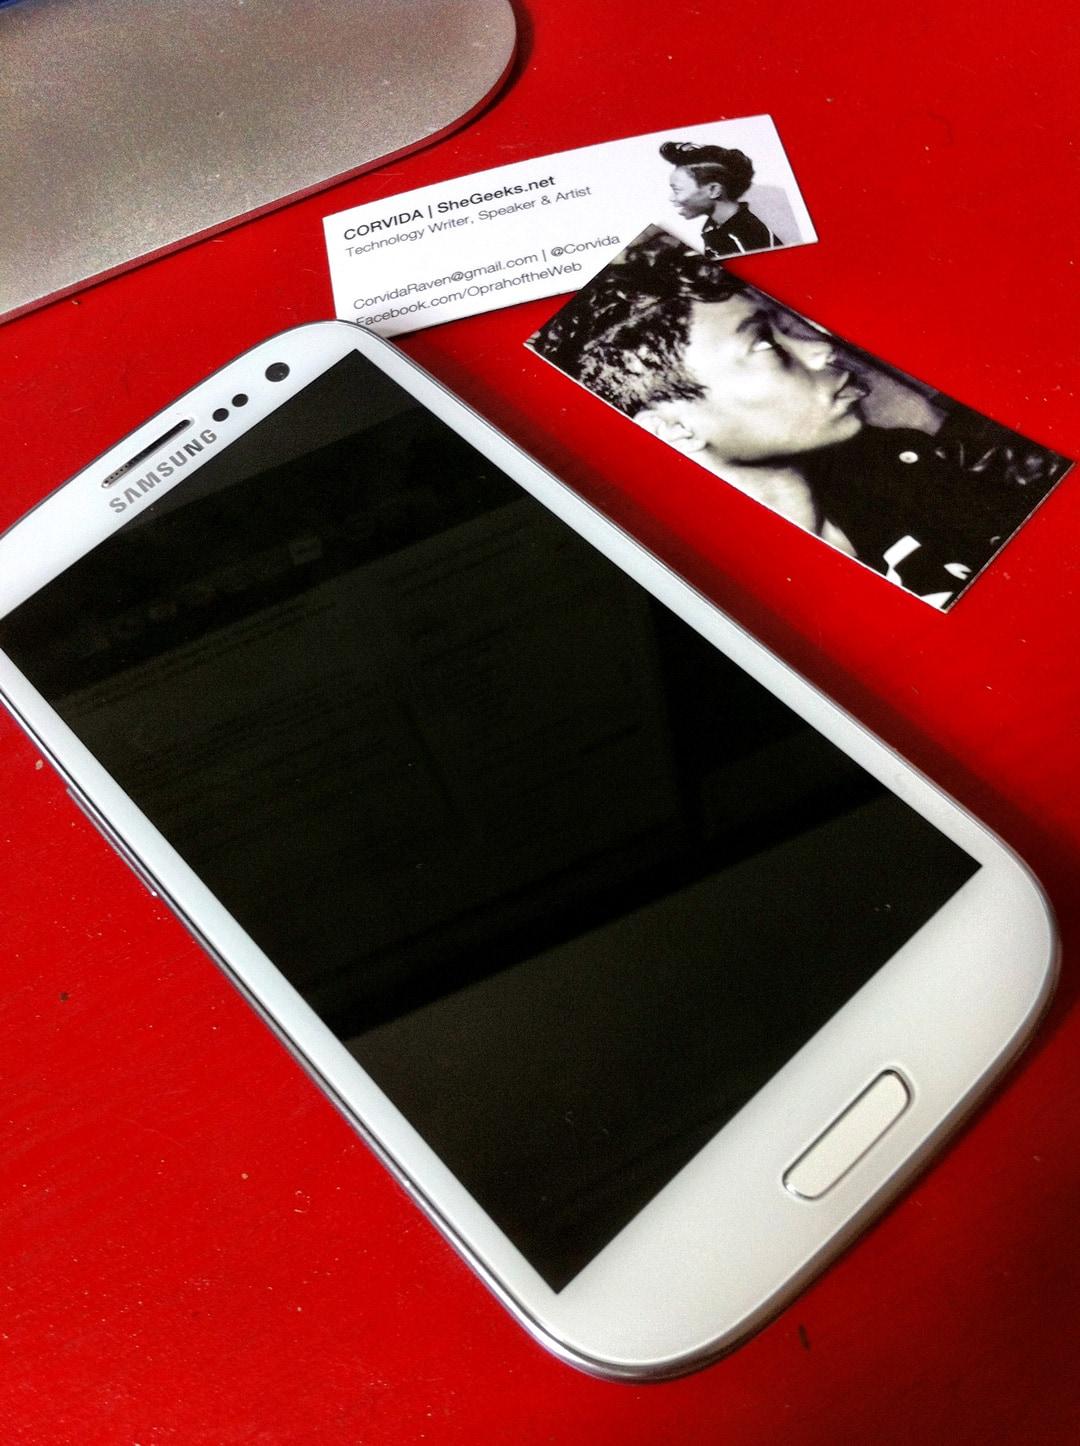 Samsung Galaxy S3 - SheGeeks Review